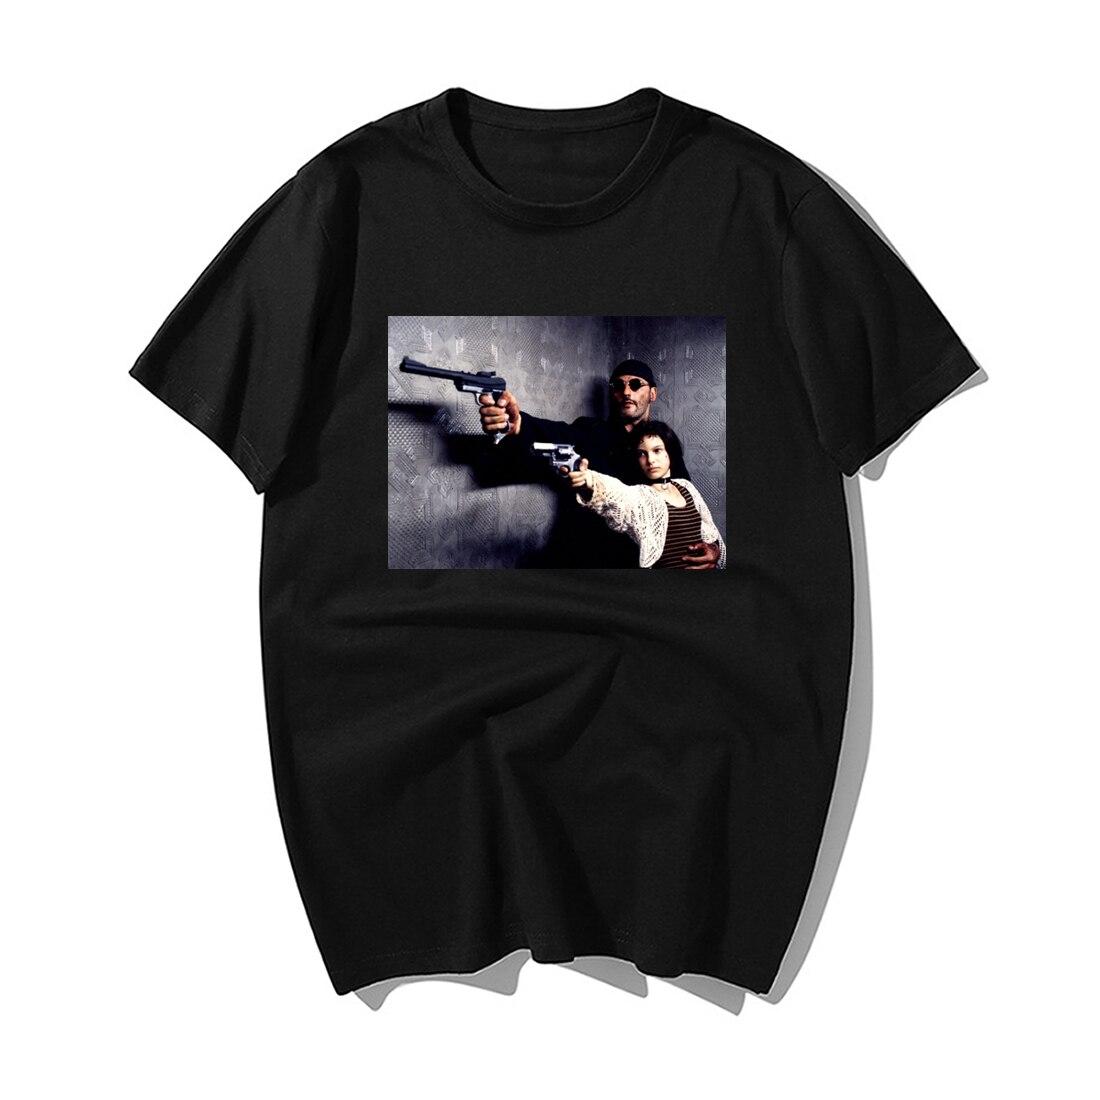 Classic Movie Leon The Professional Print T Shirt Fashion Men Summer 100% Cotton Short Sleeve Tshirt Funny Men'S Tv Tshirts